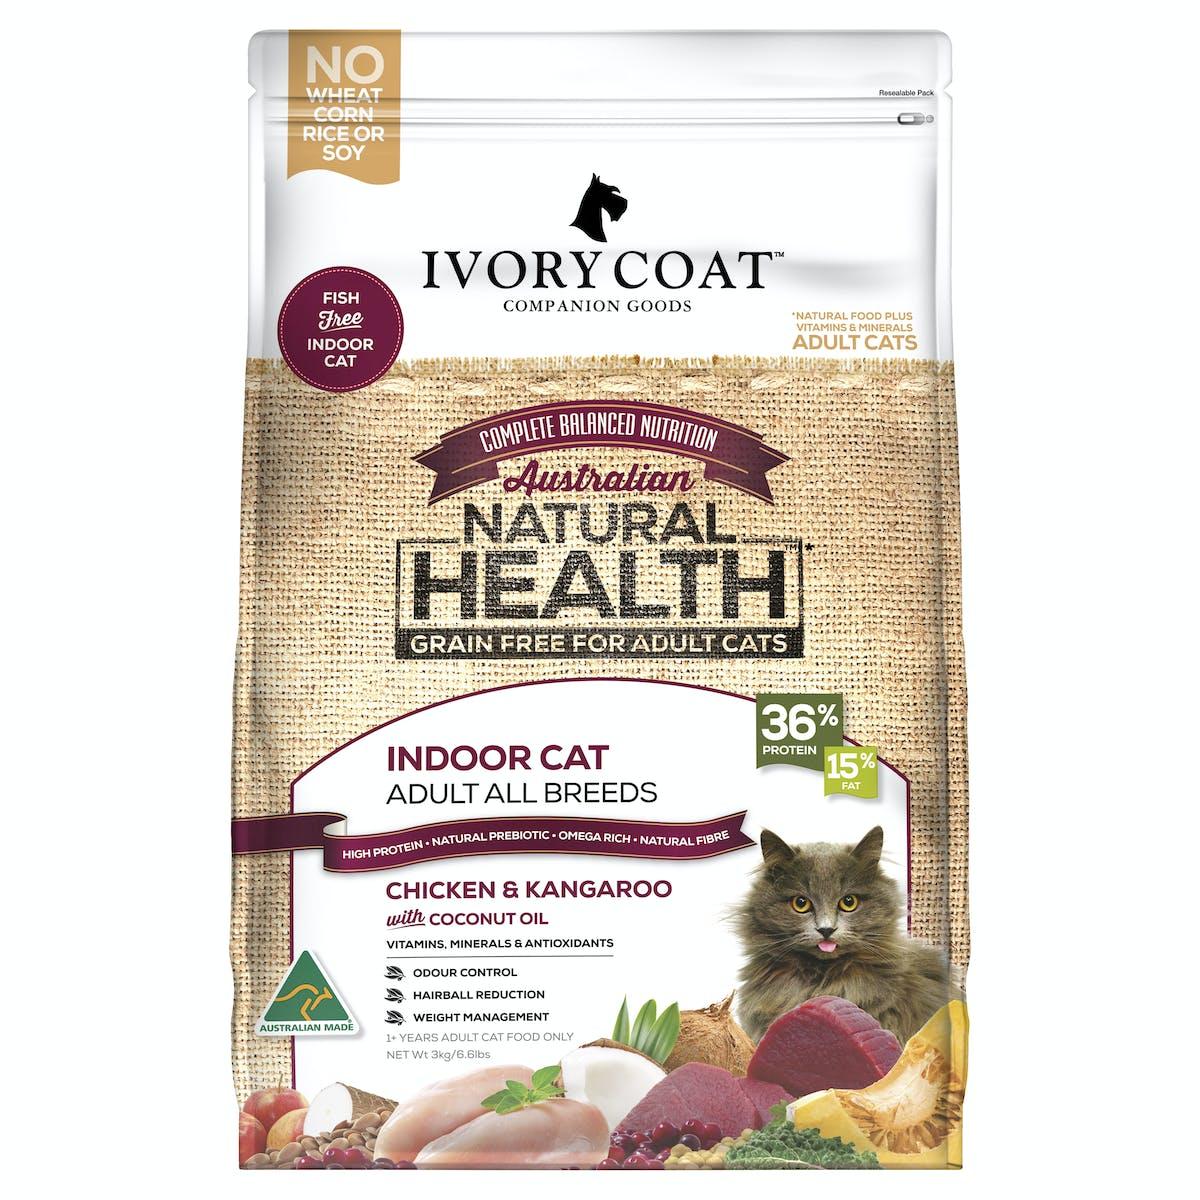 Ivory Coat | Chicken & Kangaroo | Grain-free dry cat food | Front of pack